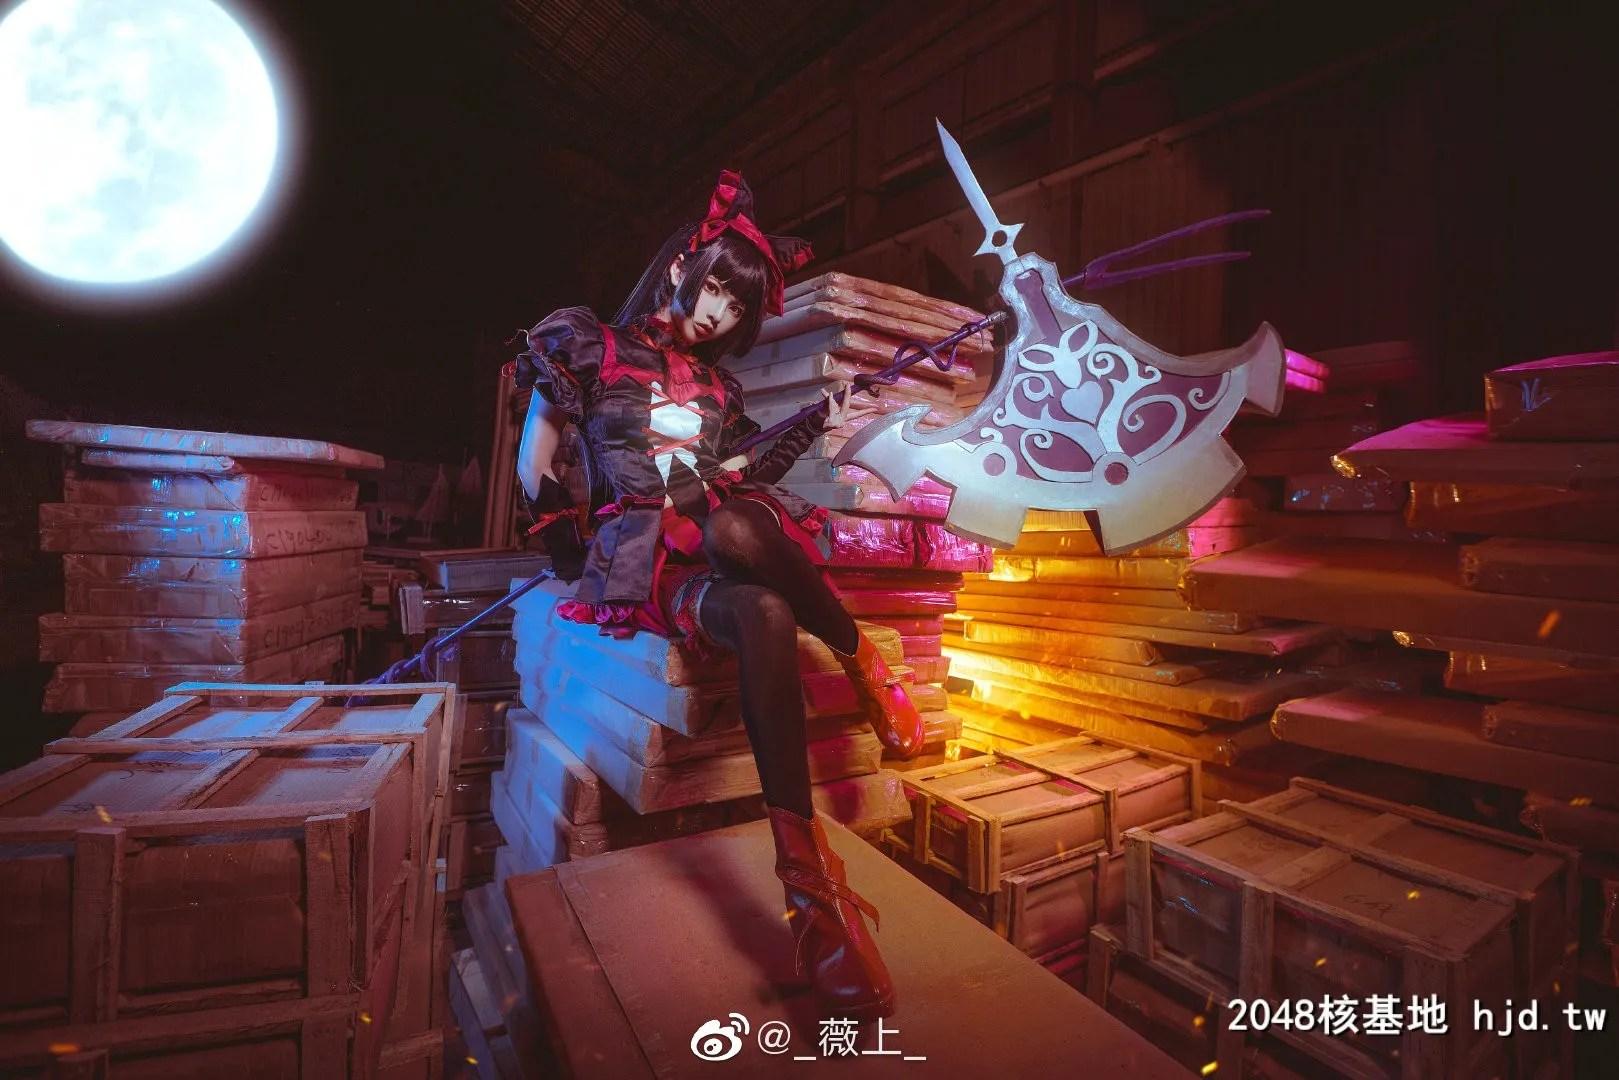 GATE奇幻自卫队萝莉·麦丘利@_薇上_ (10P)插图(4)